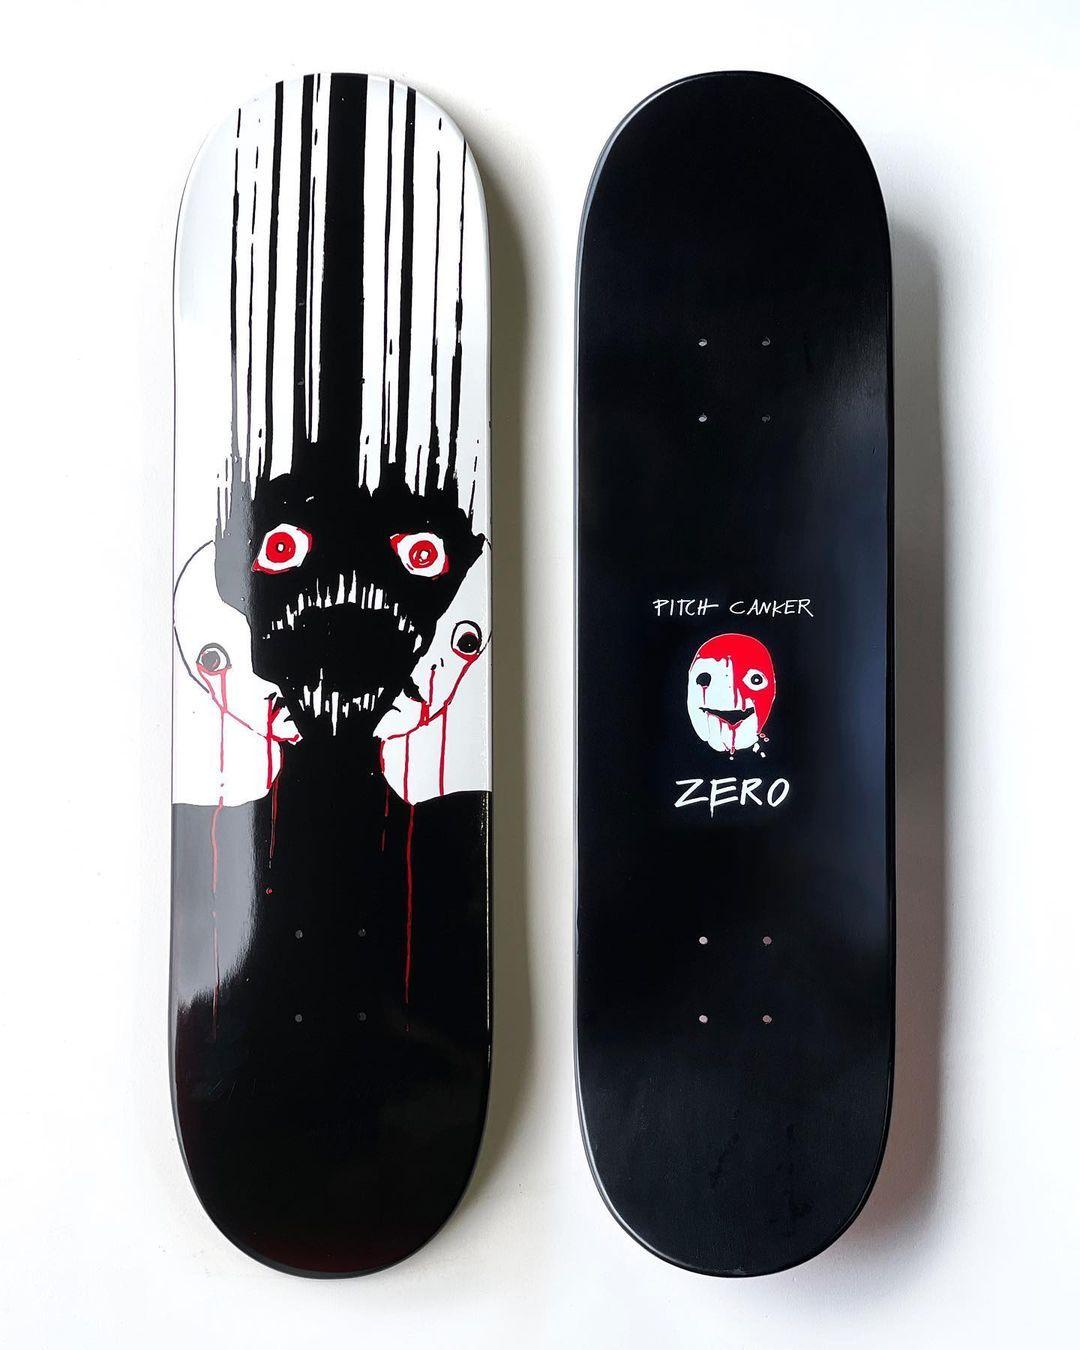 Pitch Canker X Zero Skateboards 7